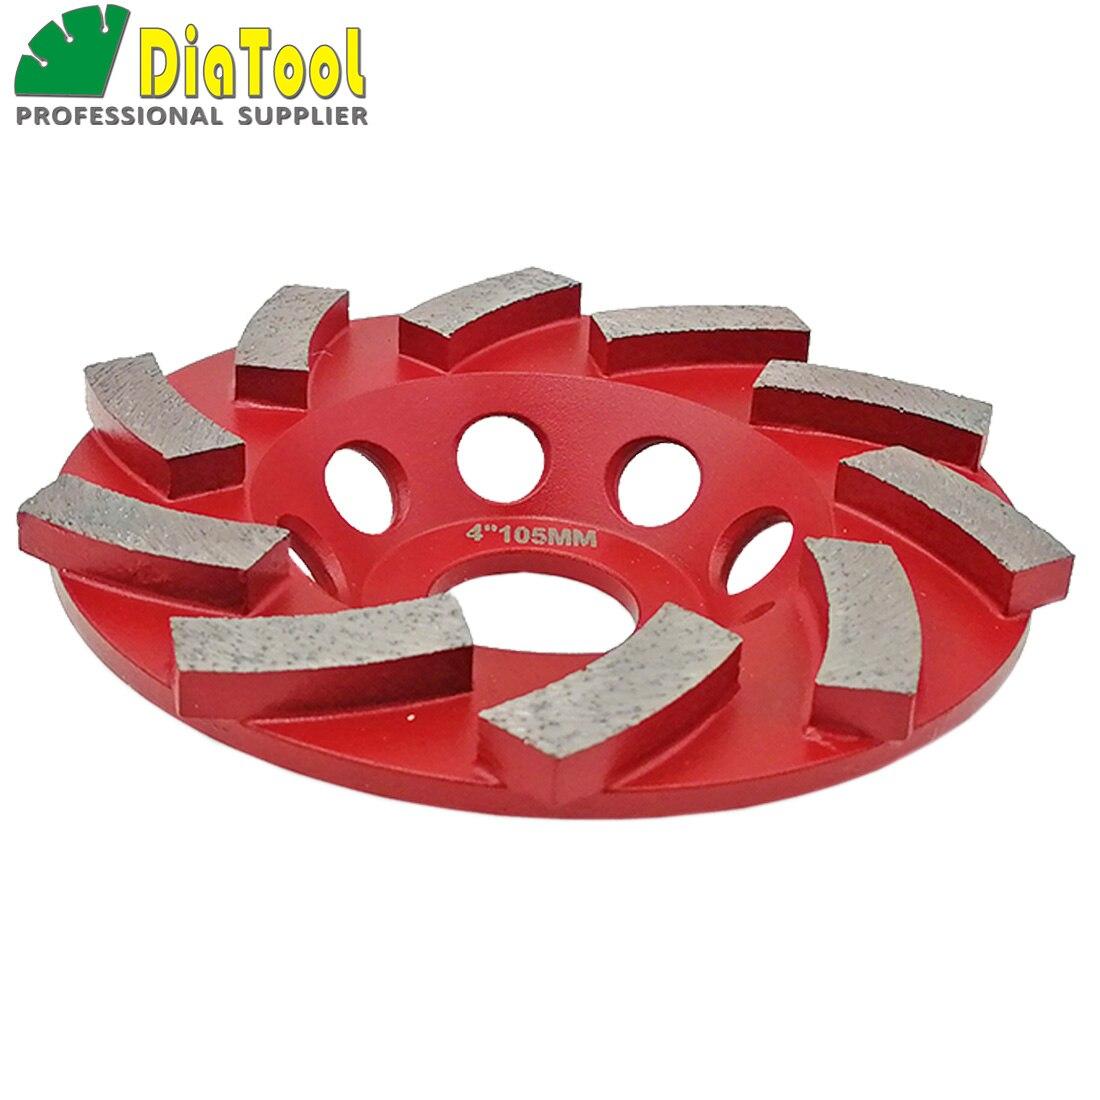 "SHDIATOOL 2pcs 4"" x10 Diamond Segmented Turbo Grinding Cup Wheel Concrete Arbor 7/8"" grinding disc"